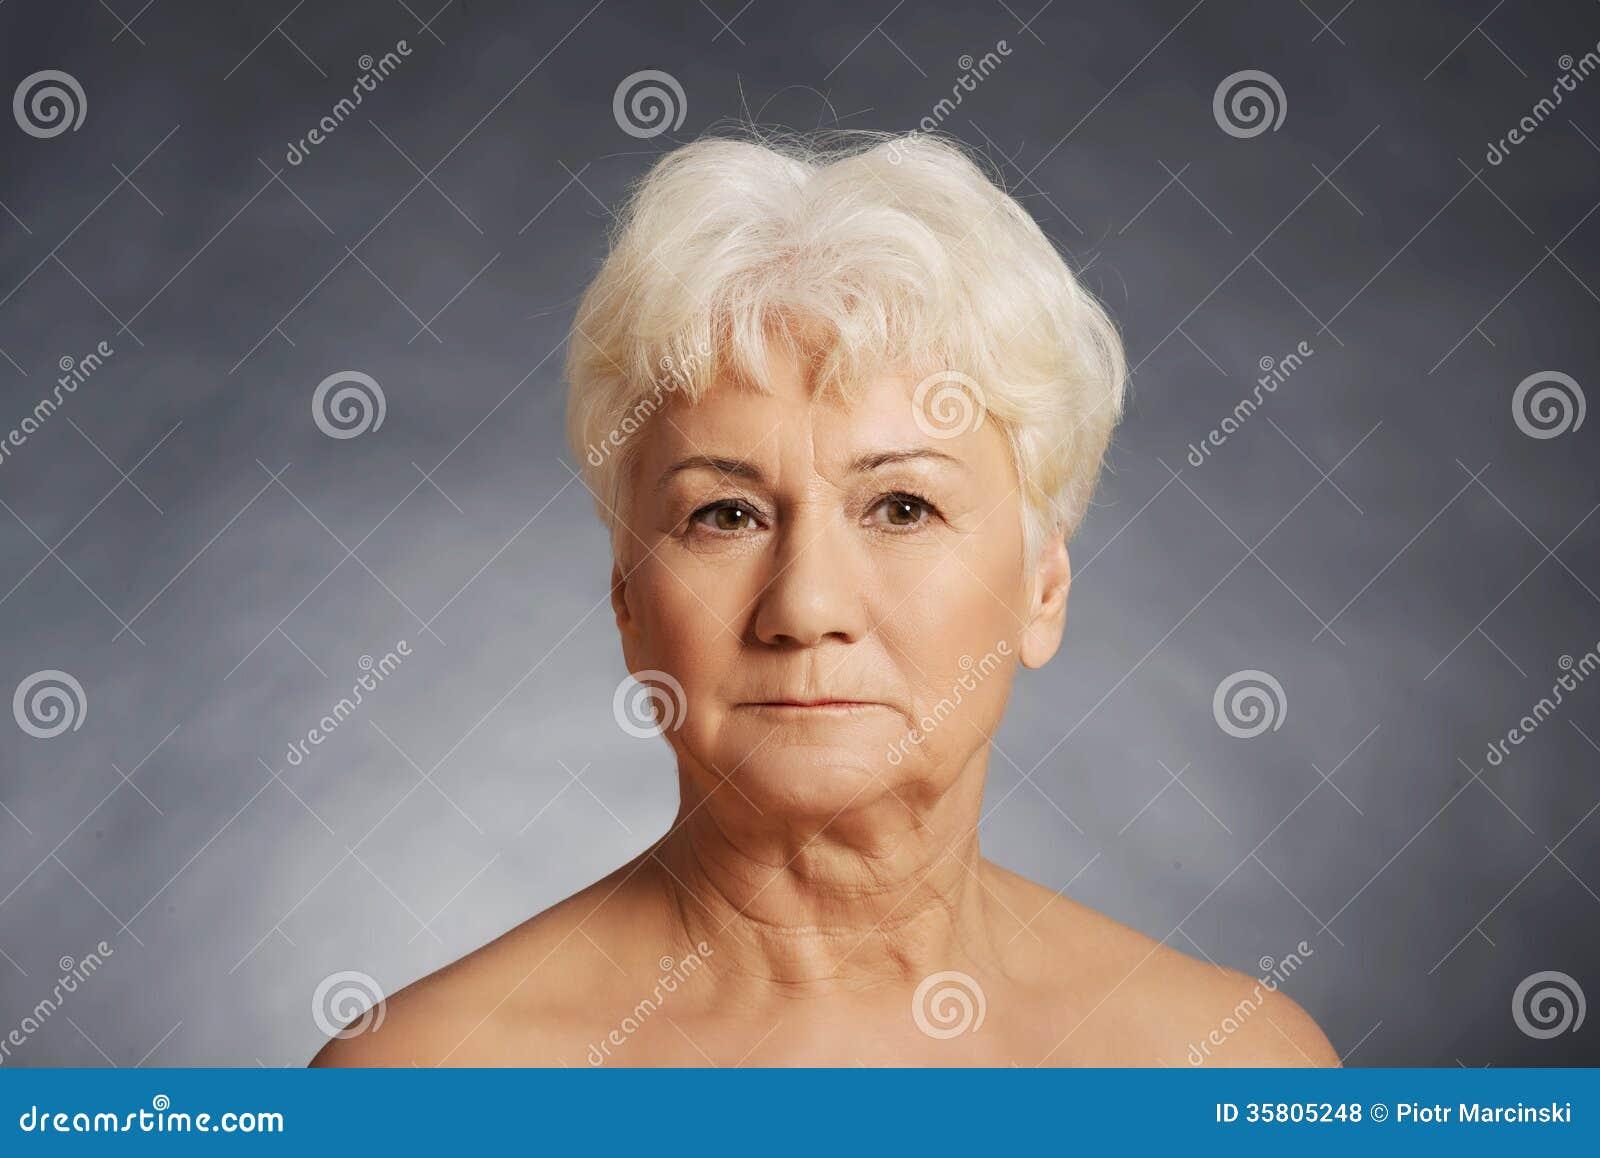 Anciana desnuda foto foto 644